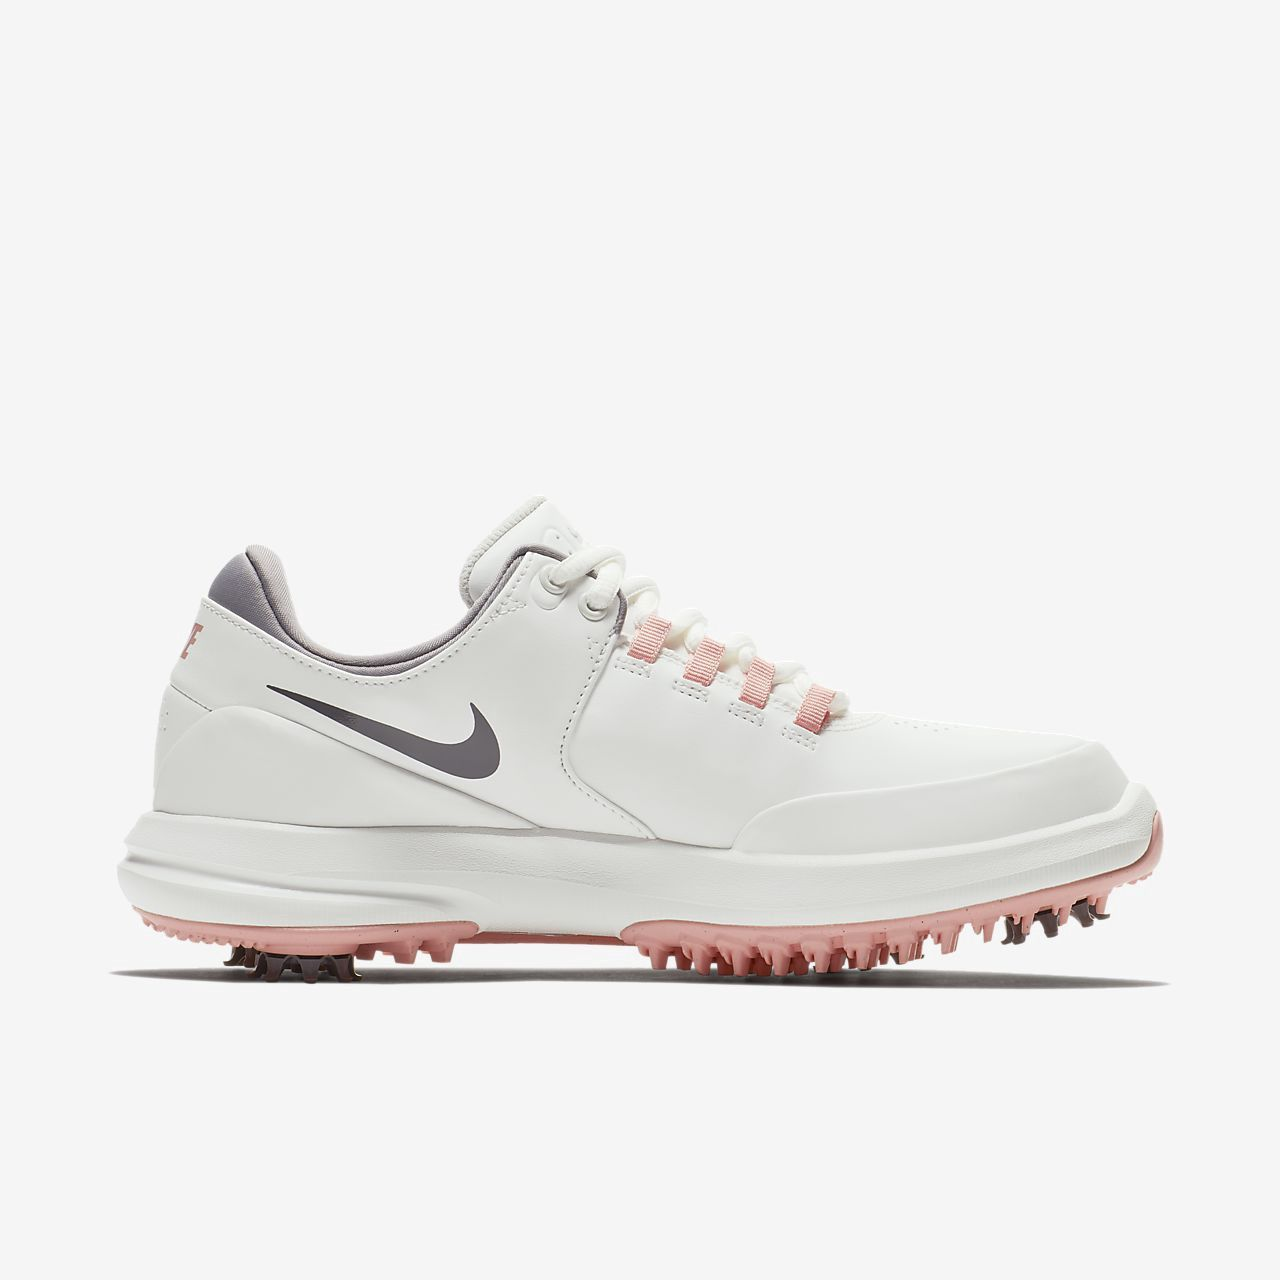 Nike Air Zoom Accurate Women's Golf Shoe 10.5 Womens